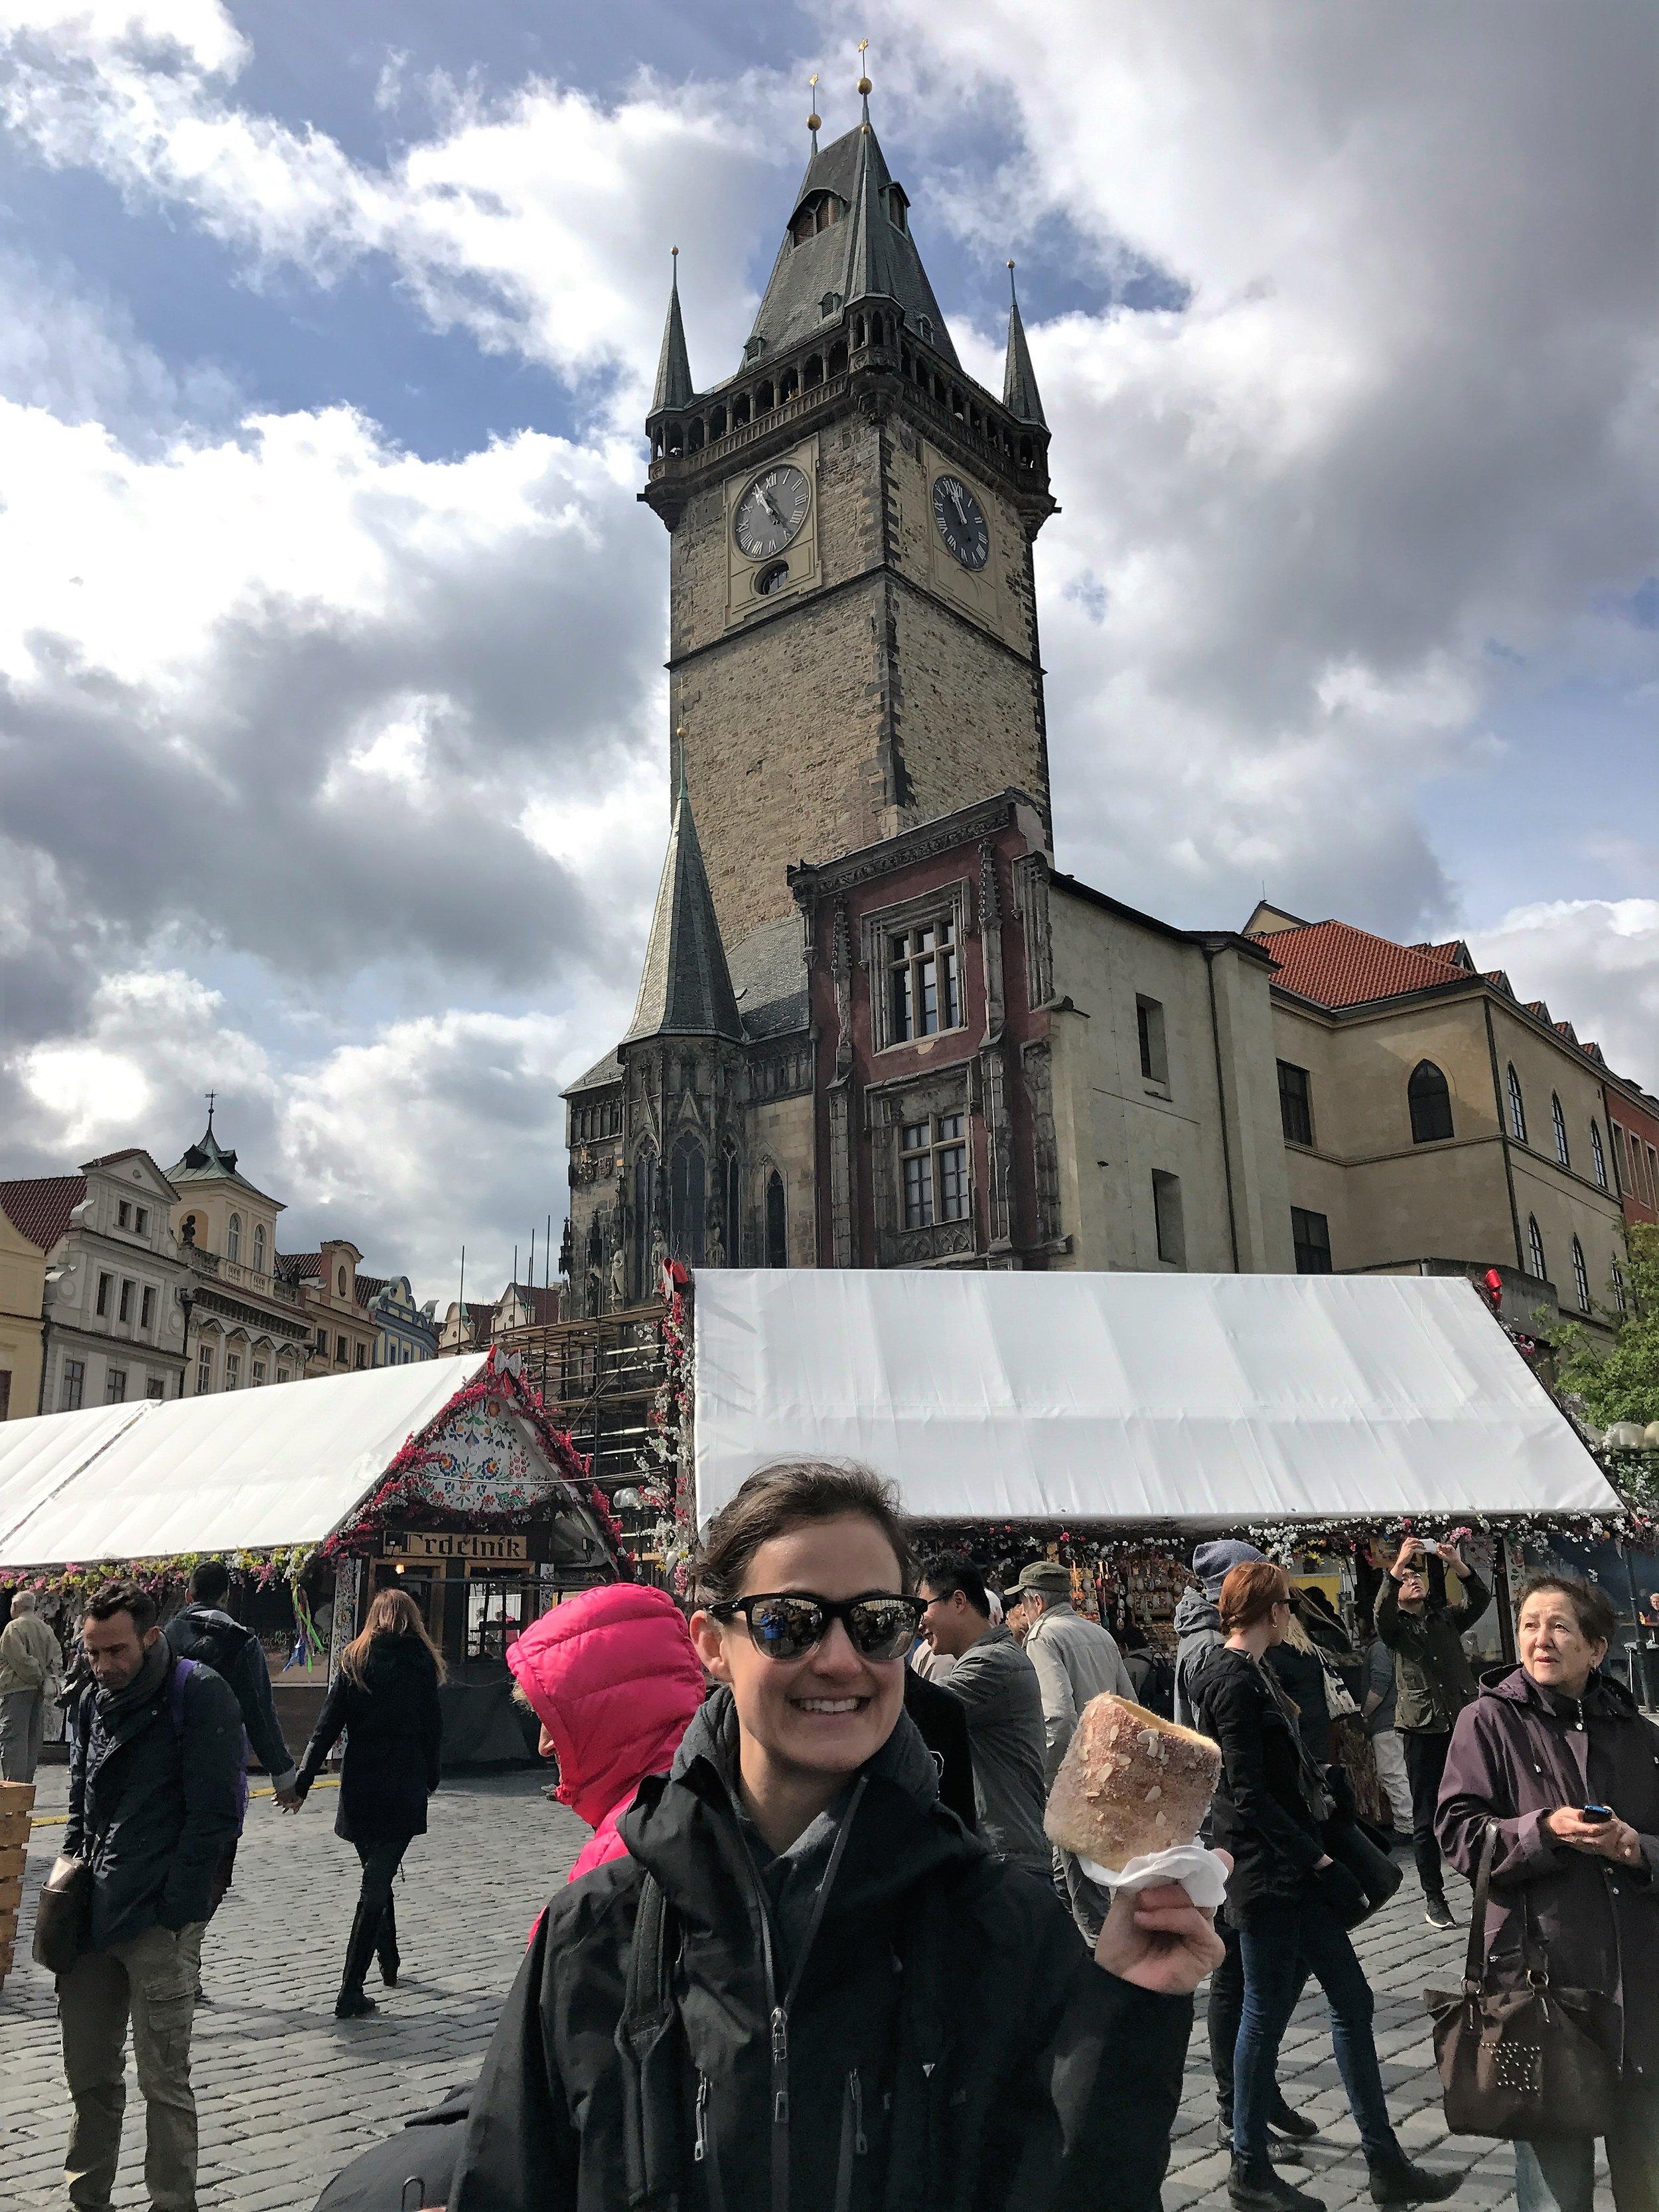 Kirby enjoying a Trdelnik at the market in Prague